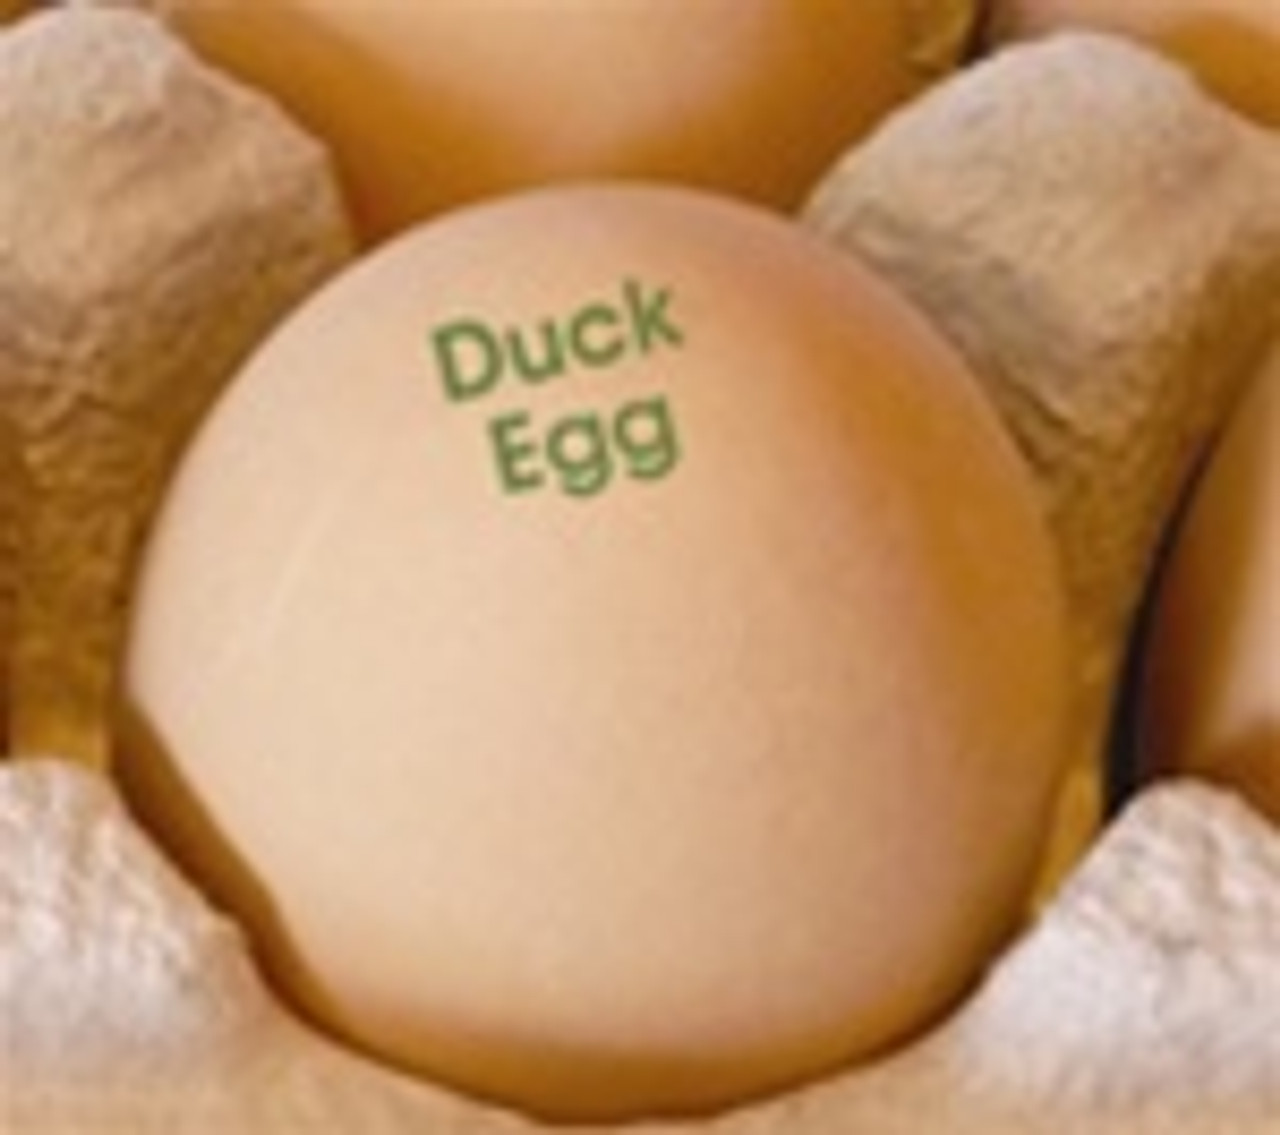 Egg Stamp - Text - Duck Egg